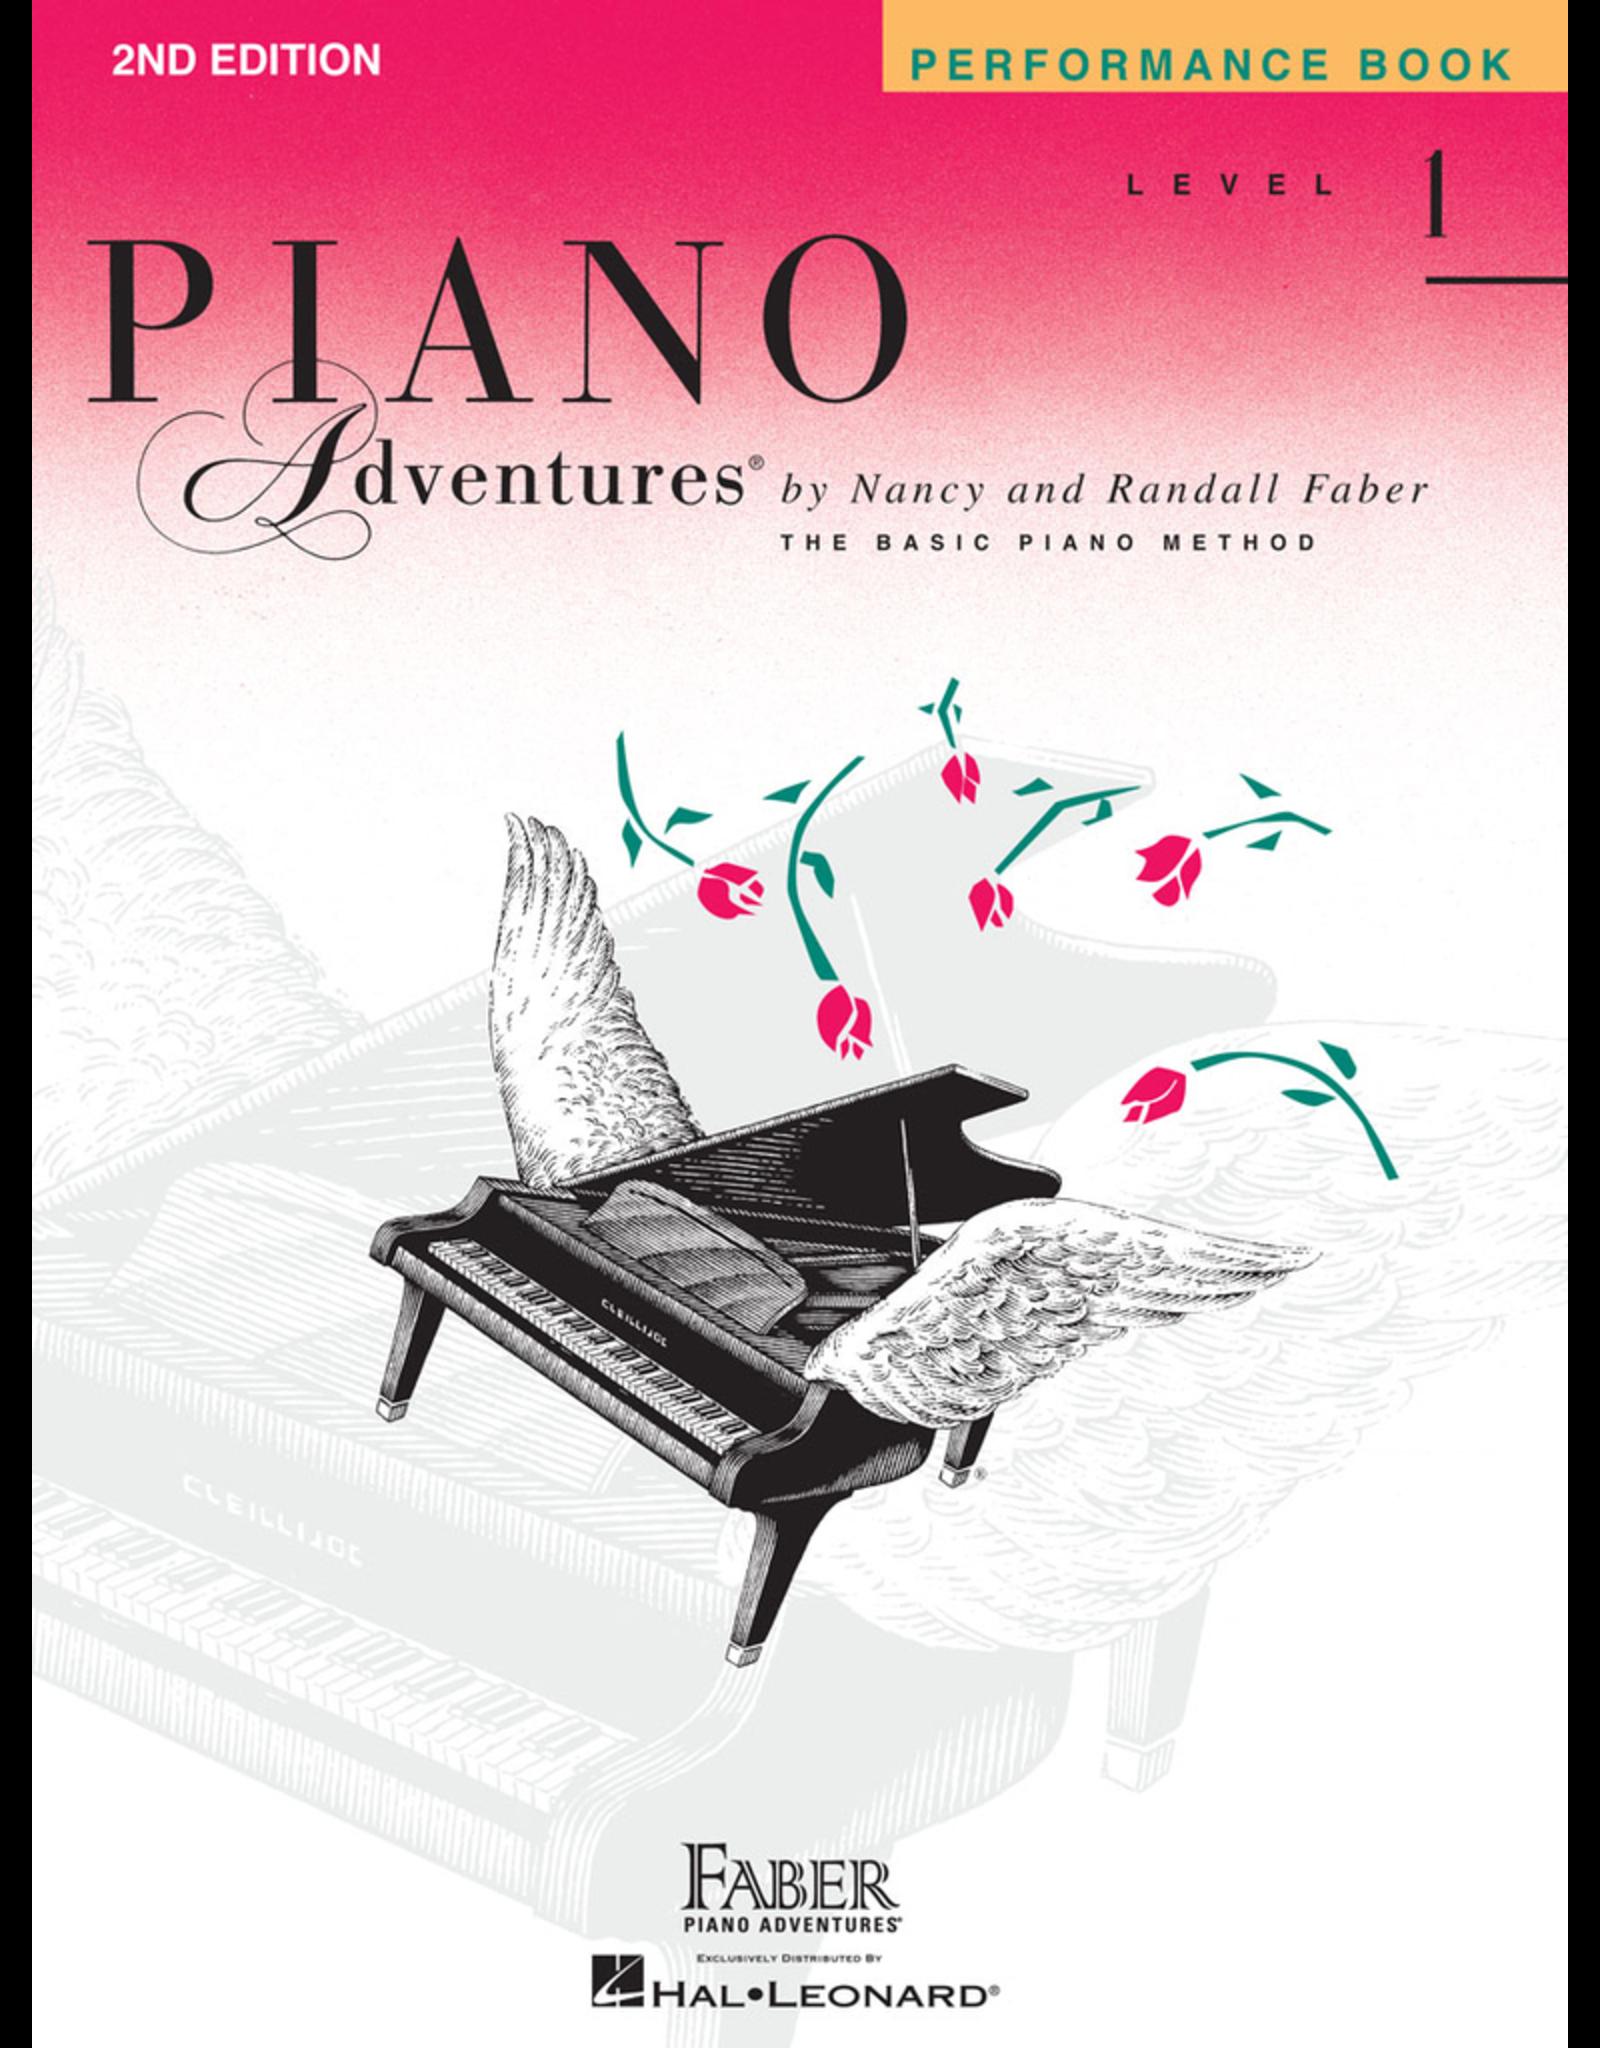 Hal Leonard Piano Adventures Performance Book, Level 1